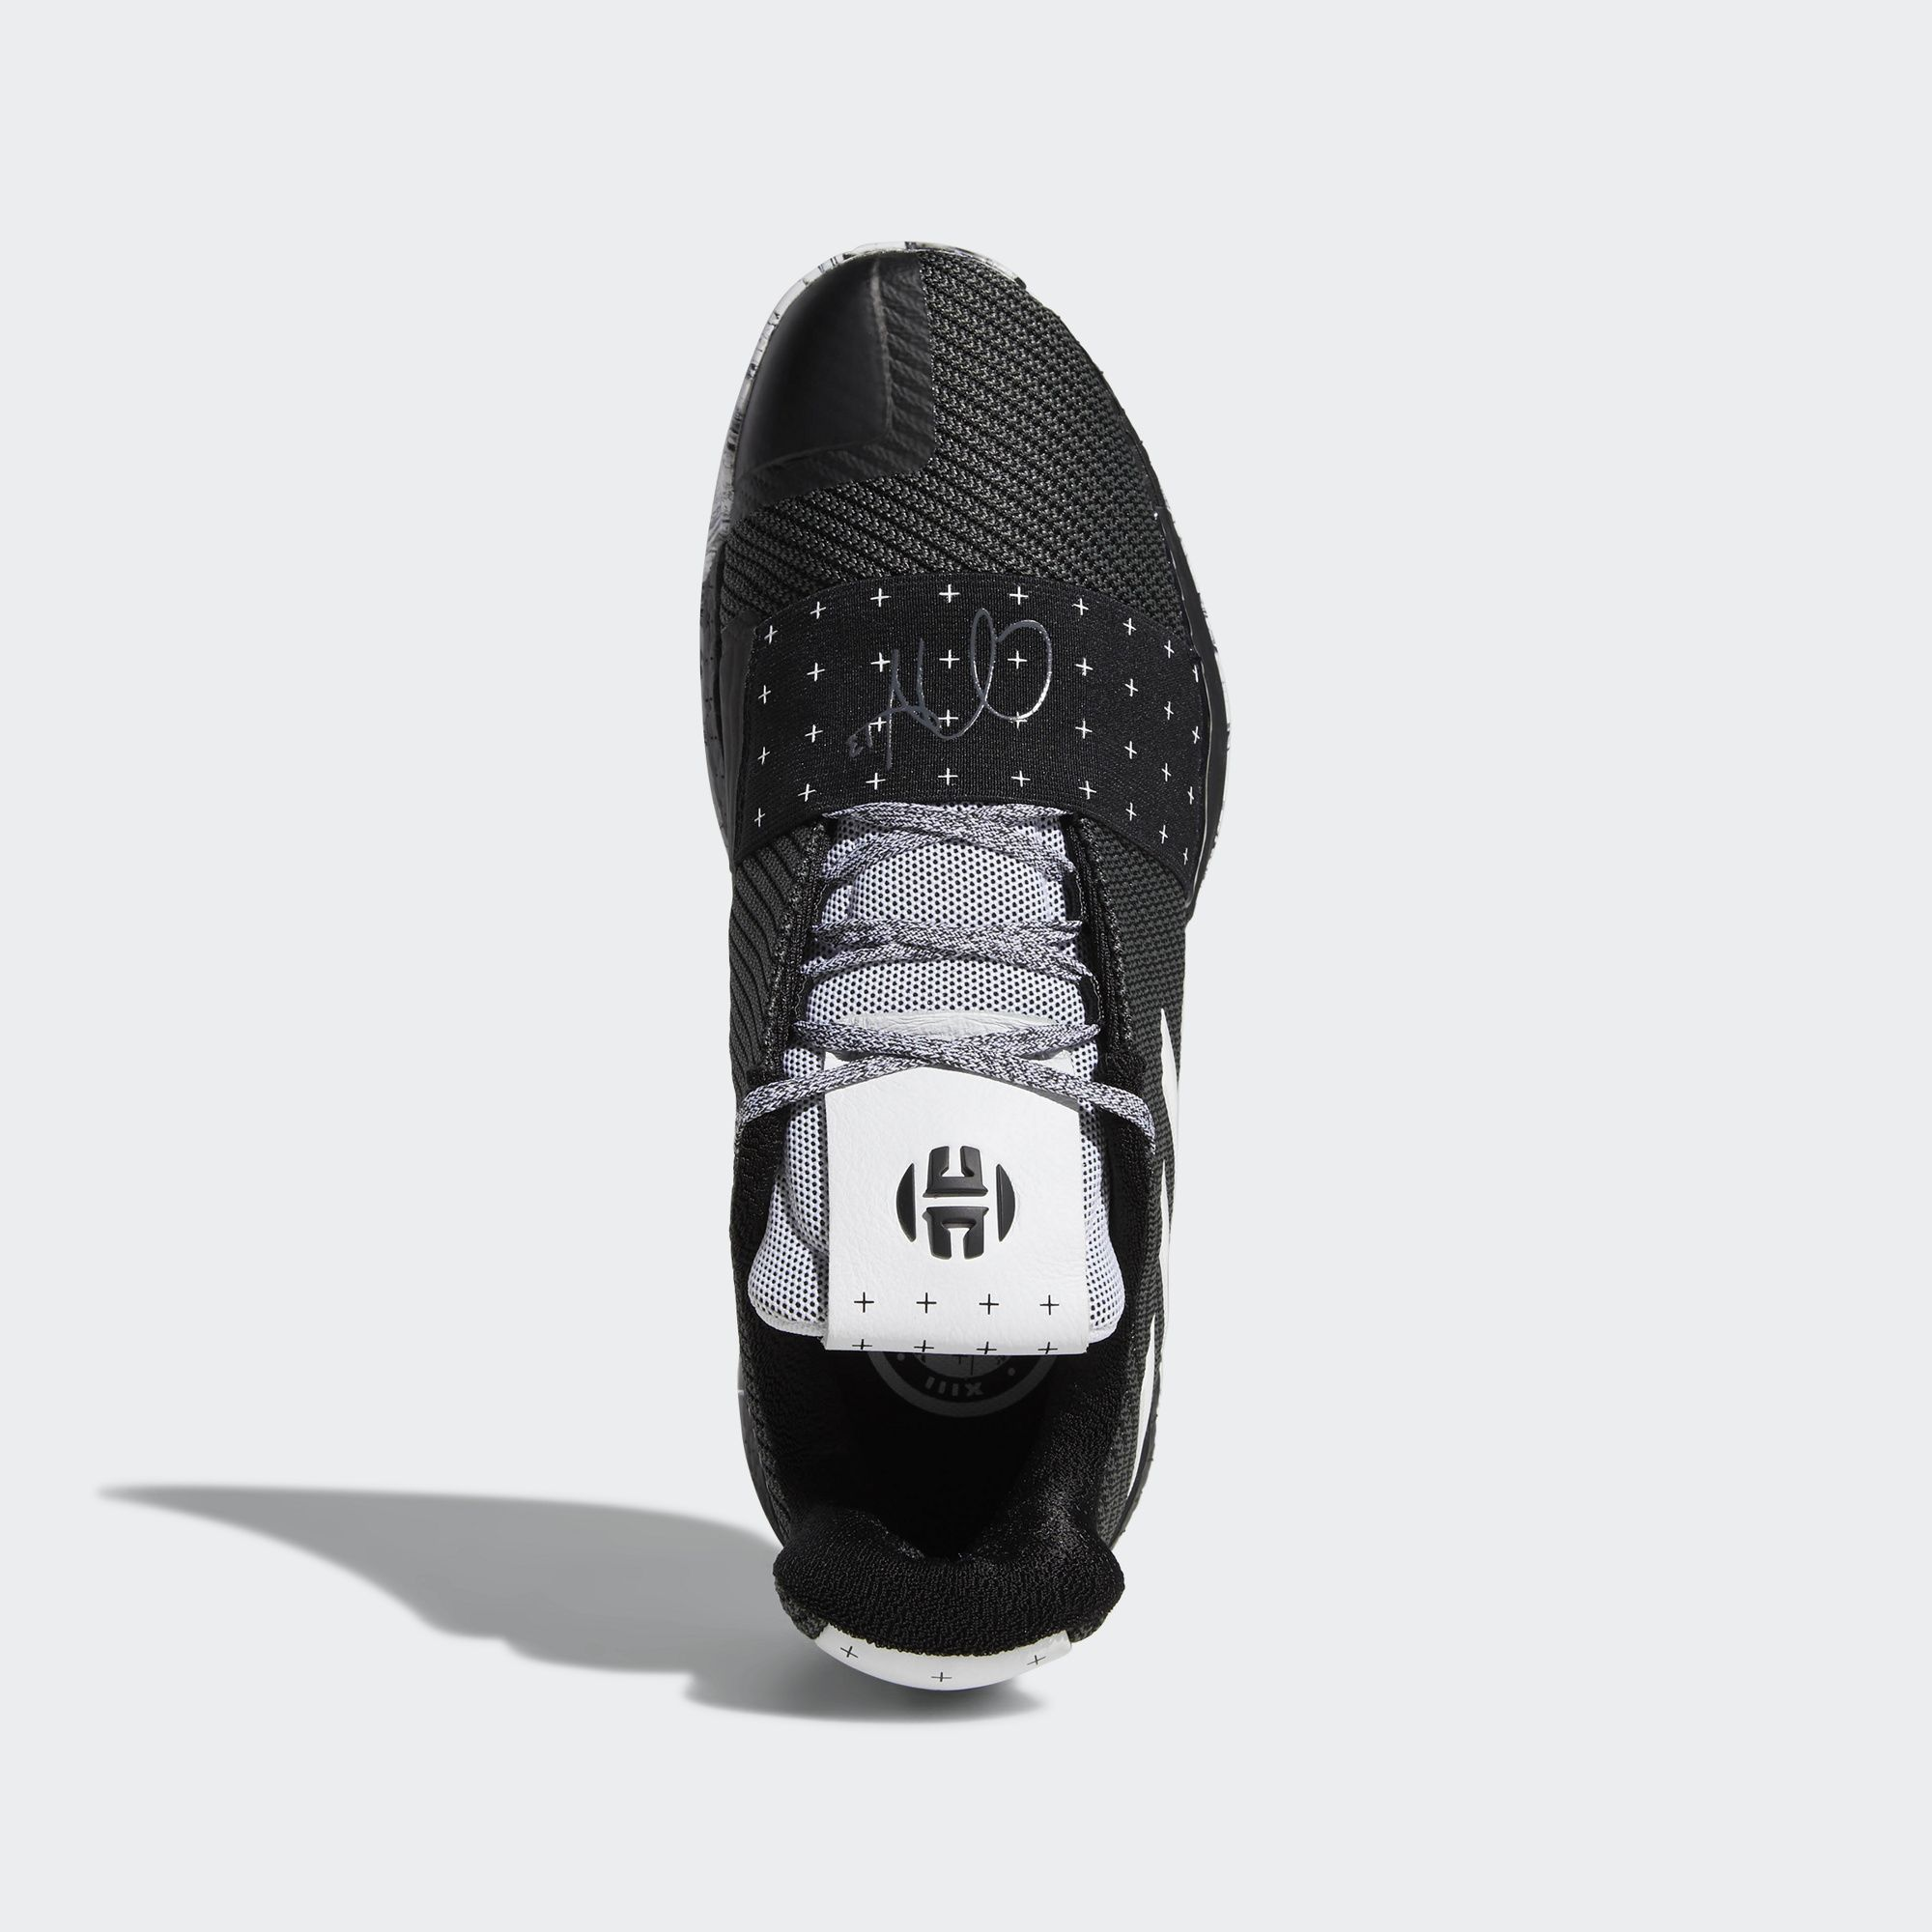 adidas harden vol 3 release date 2